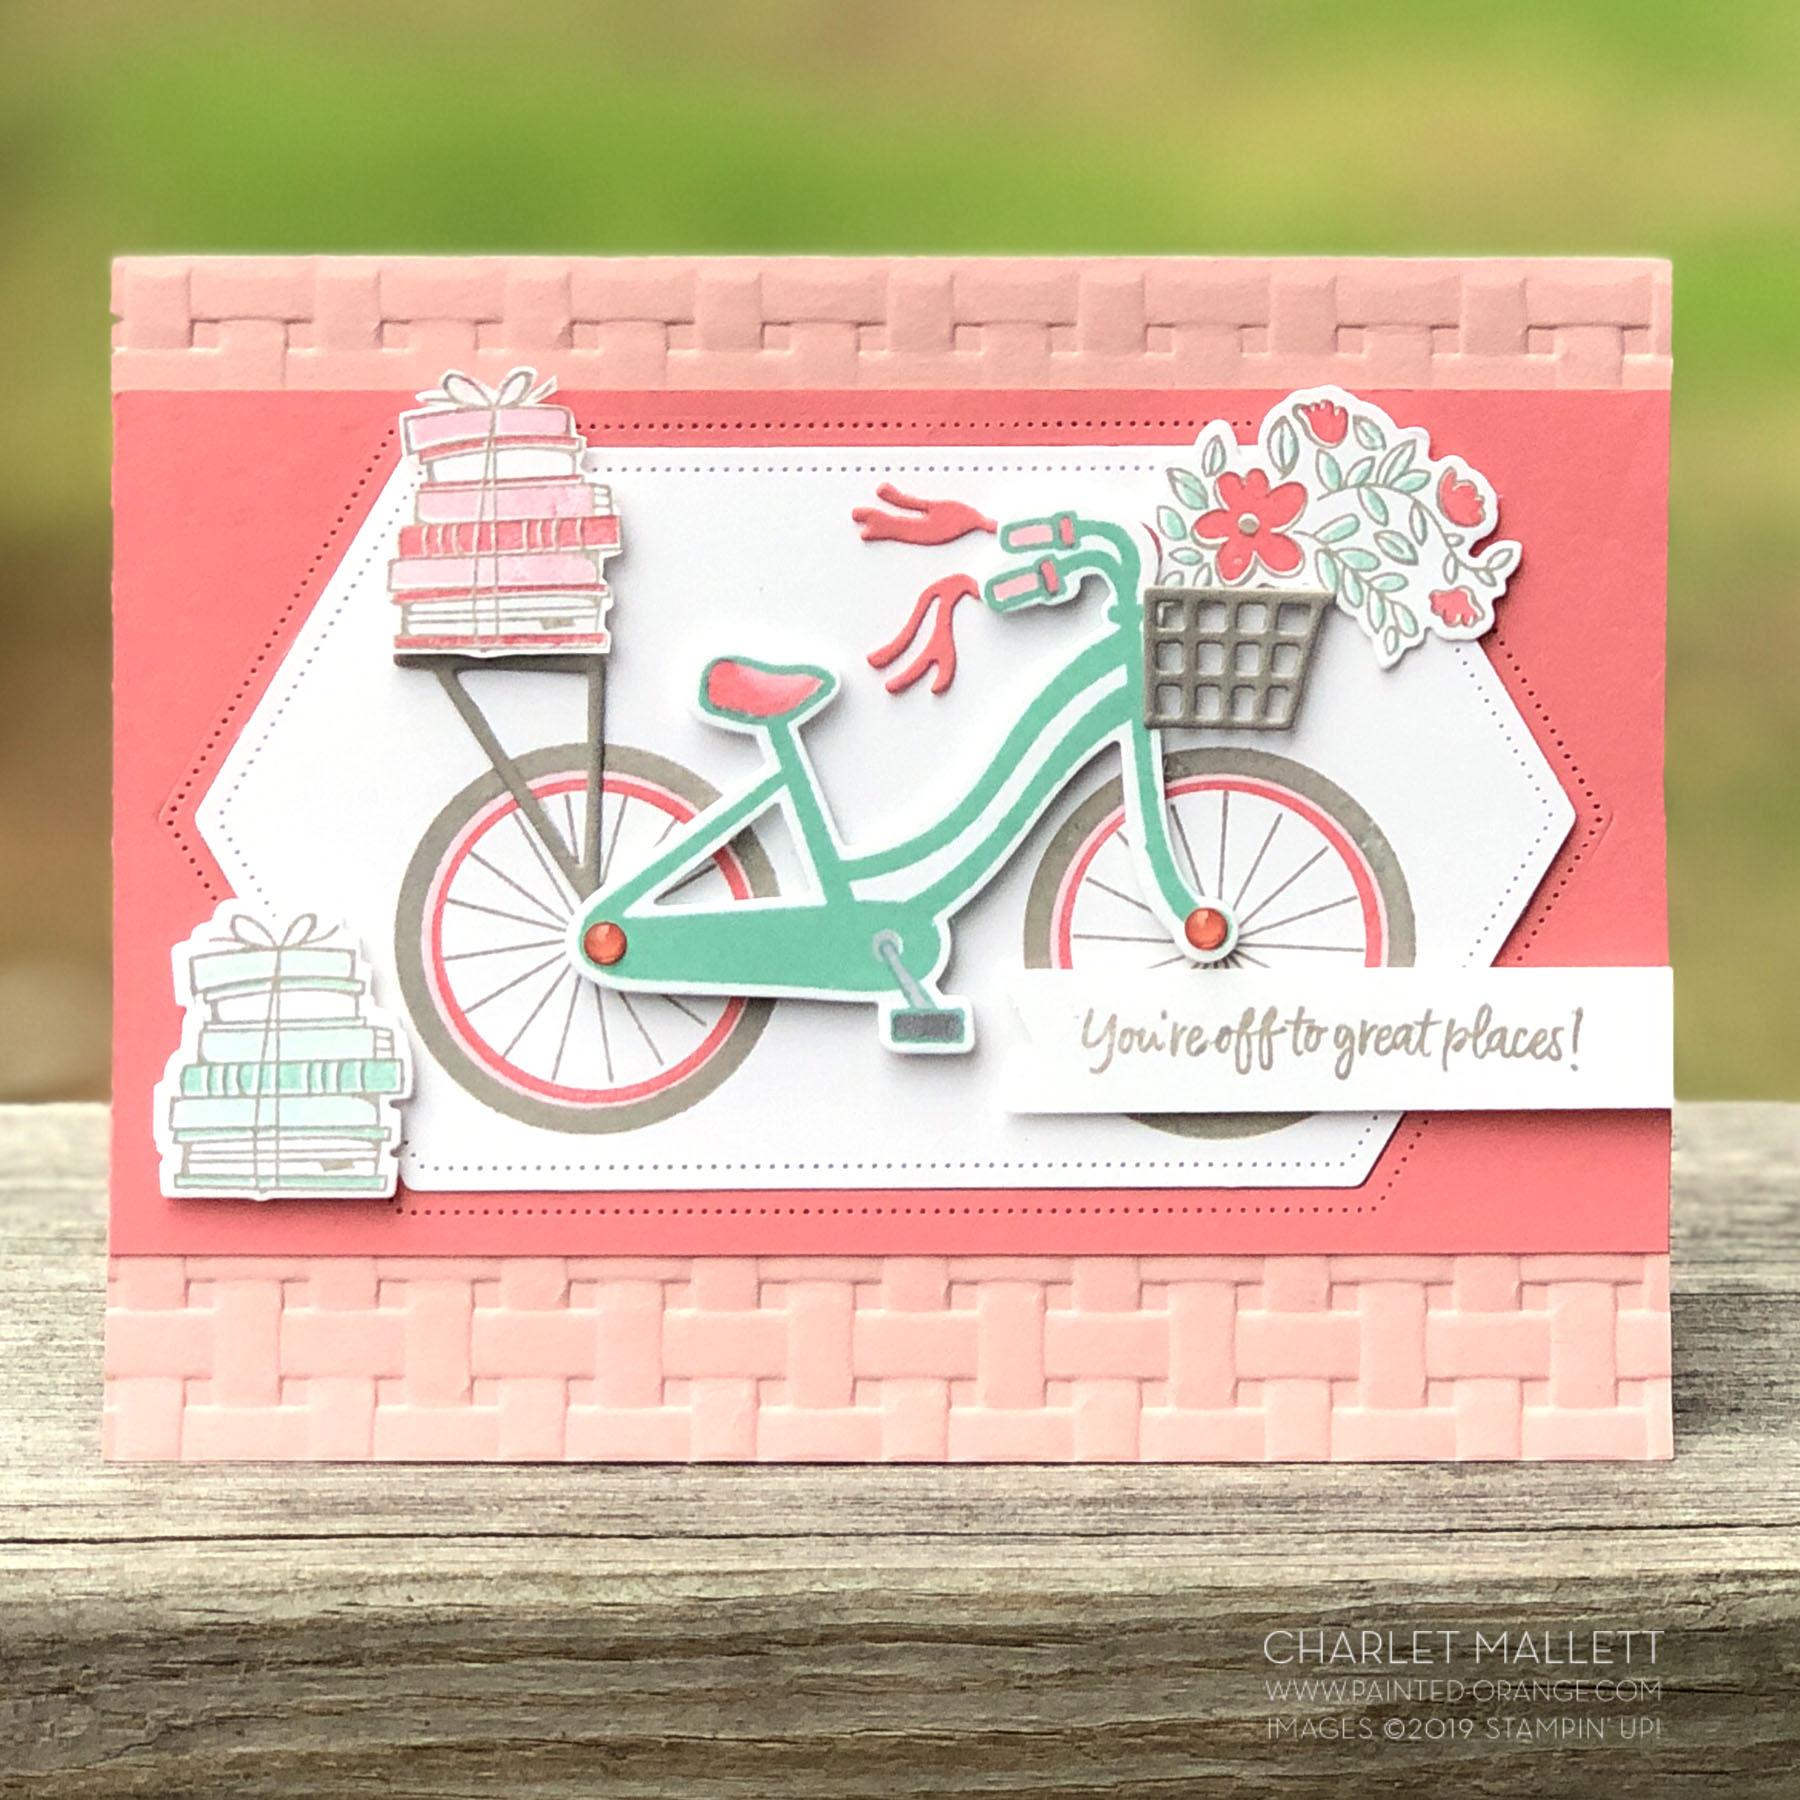 Bike Ride Graduation Card - Charlet Mallett, Stampin' Up!